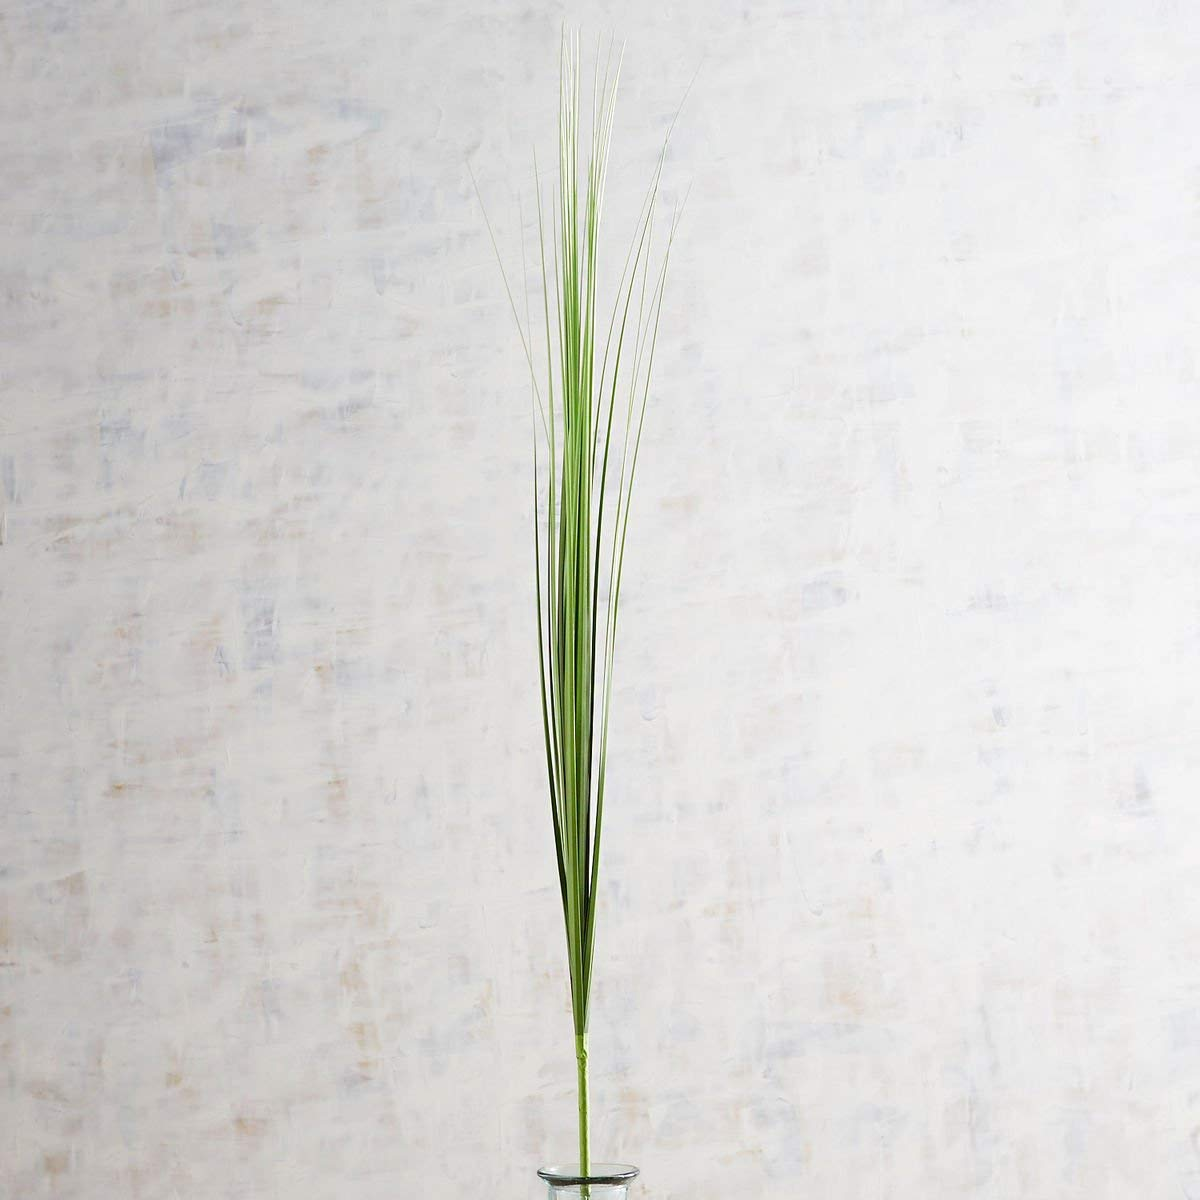 3 Pcs 65th Birthday Anniversary Multi Color Onion Grass Spray Metallic Pick